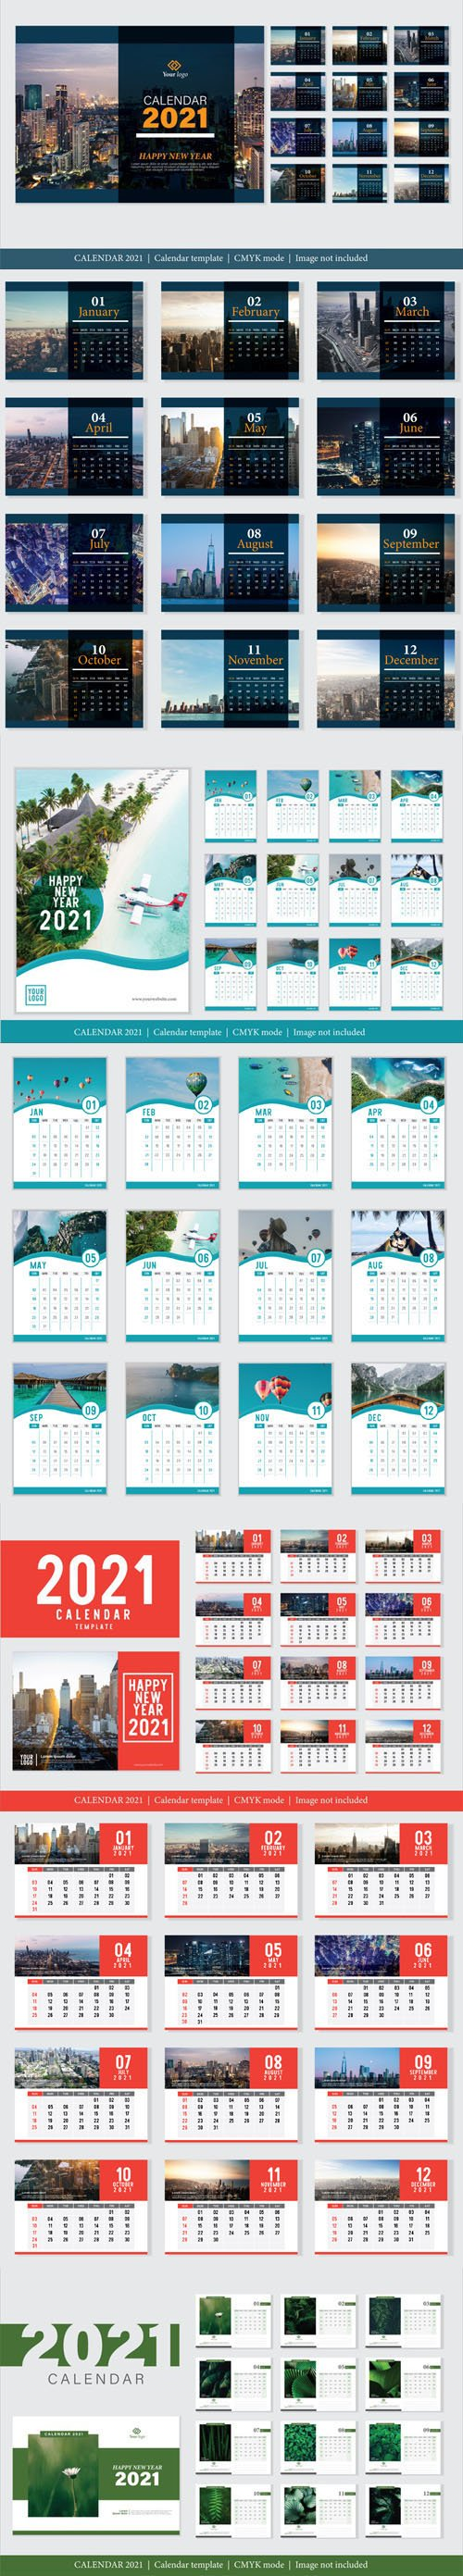 8 Modern Professional 2021 Calendar Design Vector Templates